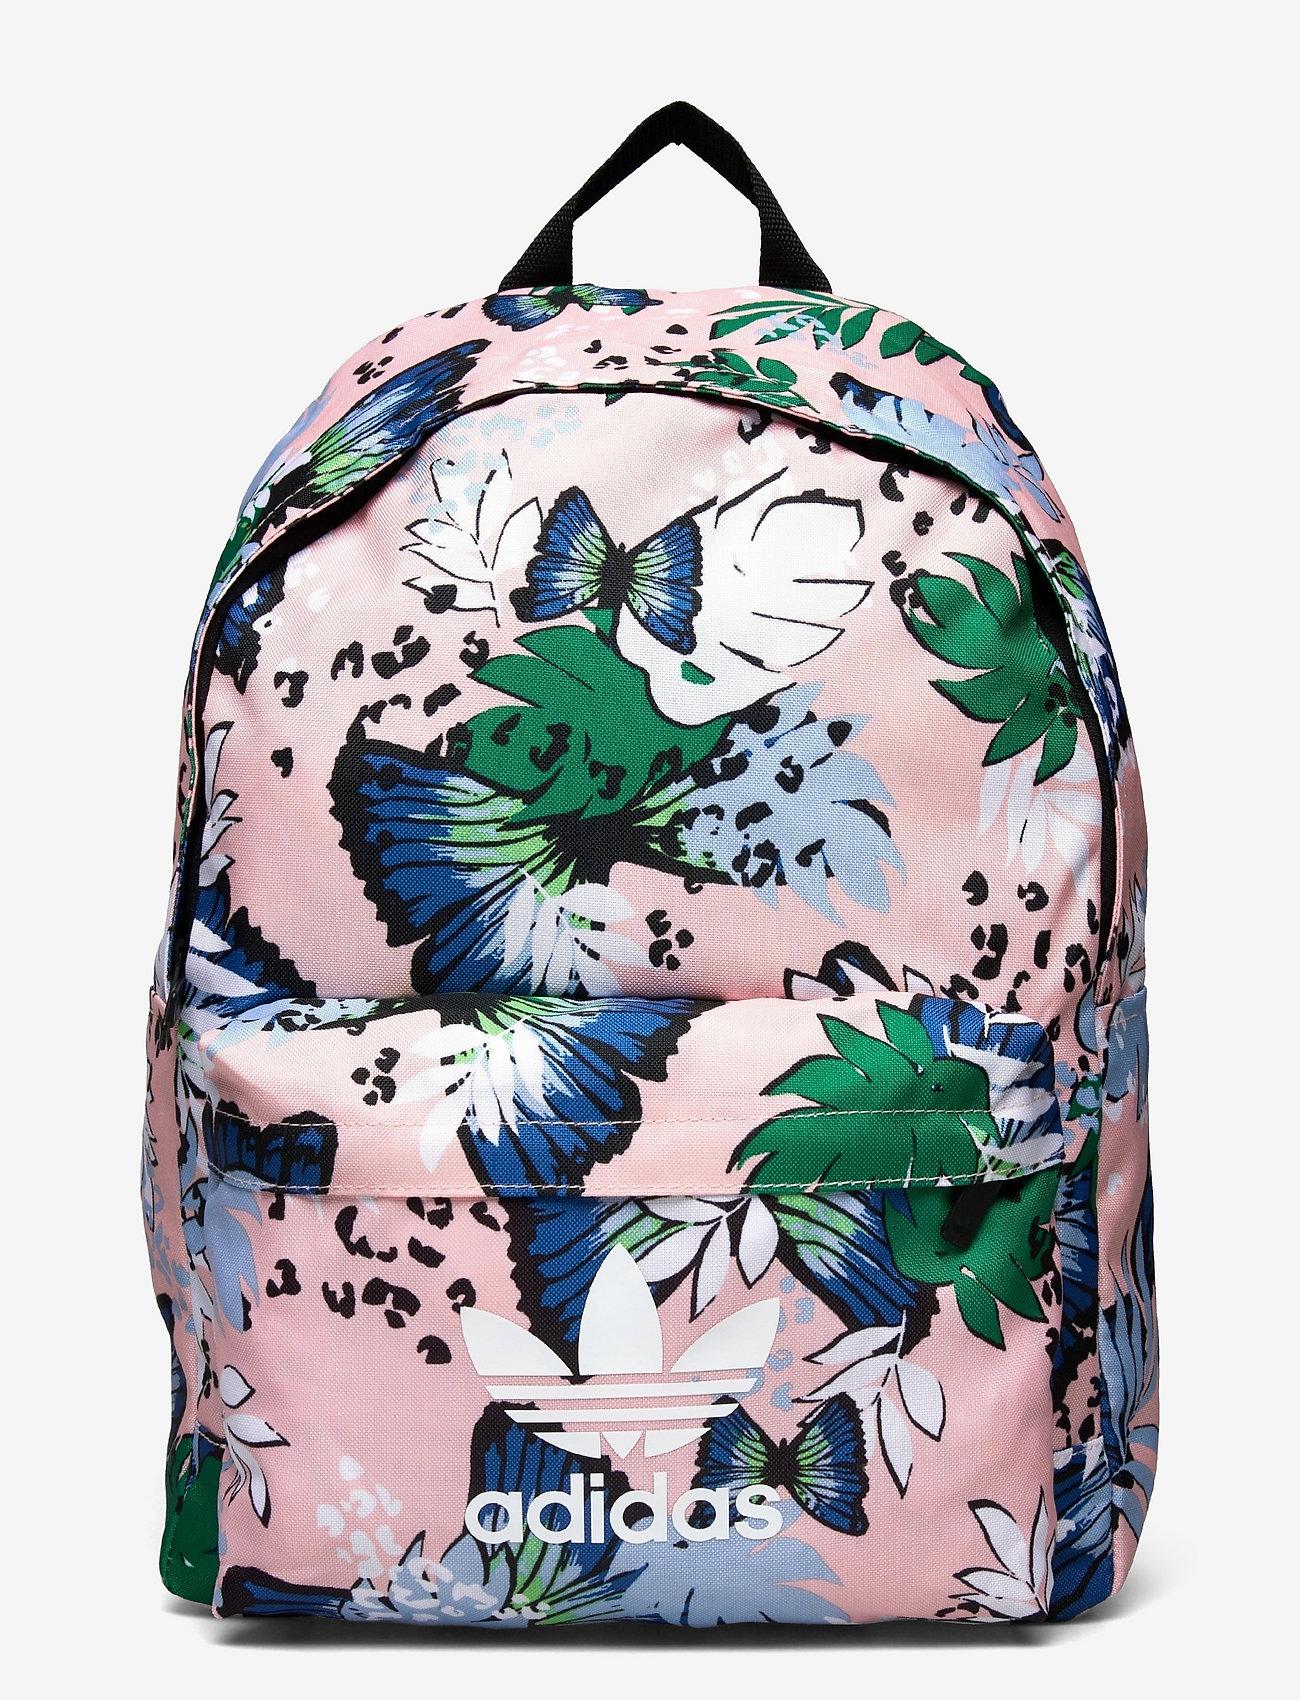 HER Studio London Classic Backpack